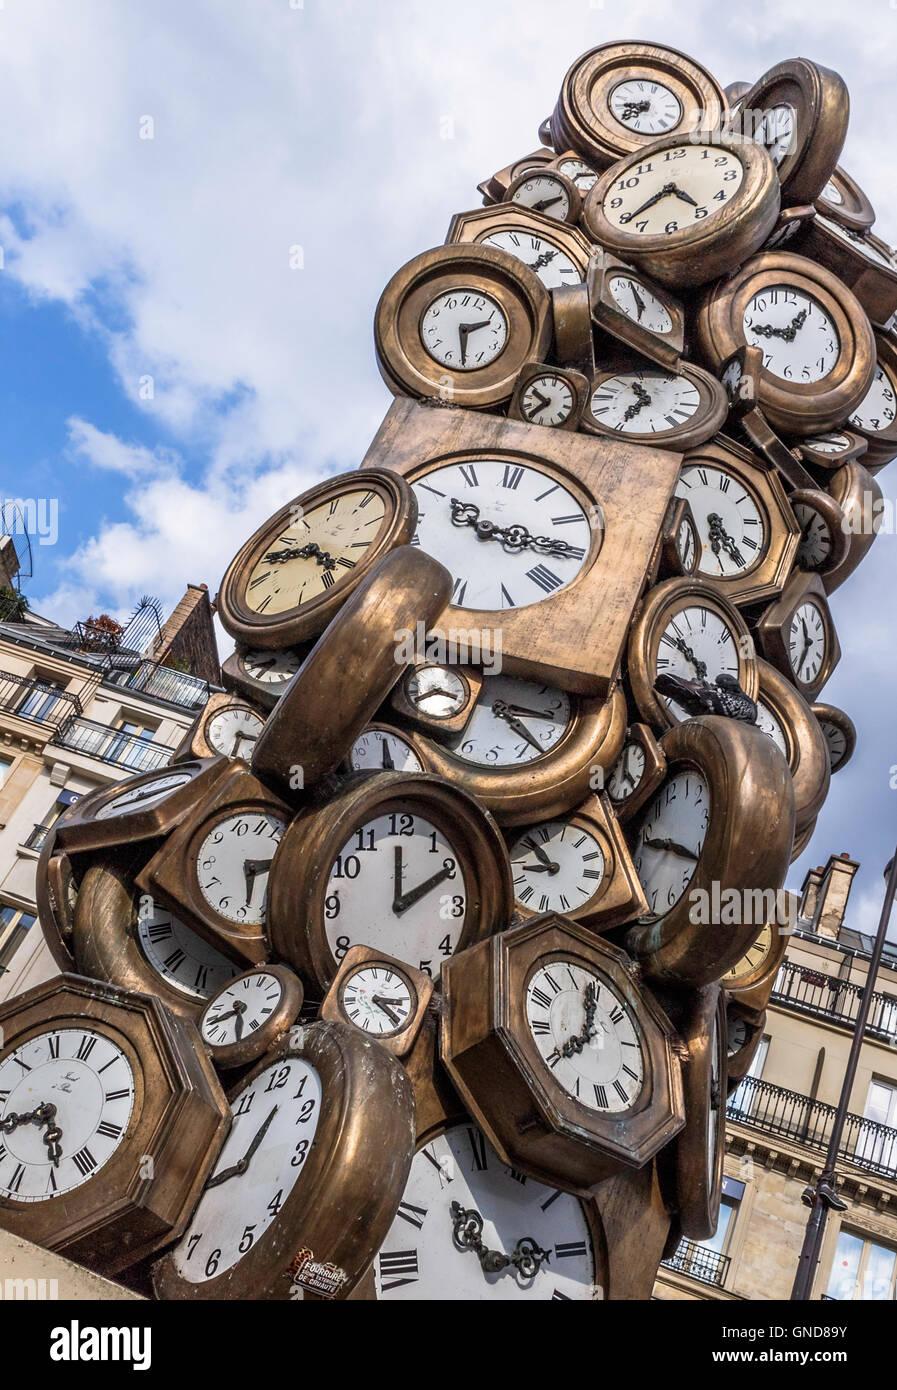 Clock sculpture at St. Lazare Station, Paris - Stock Image